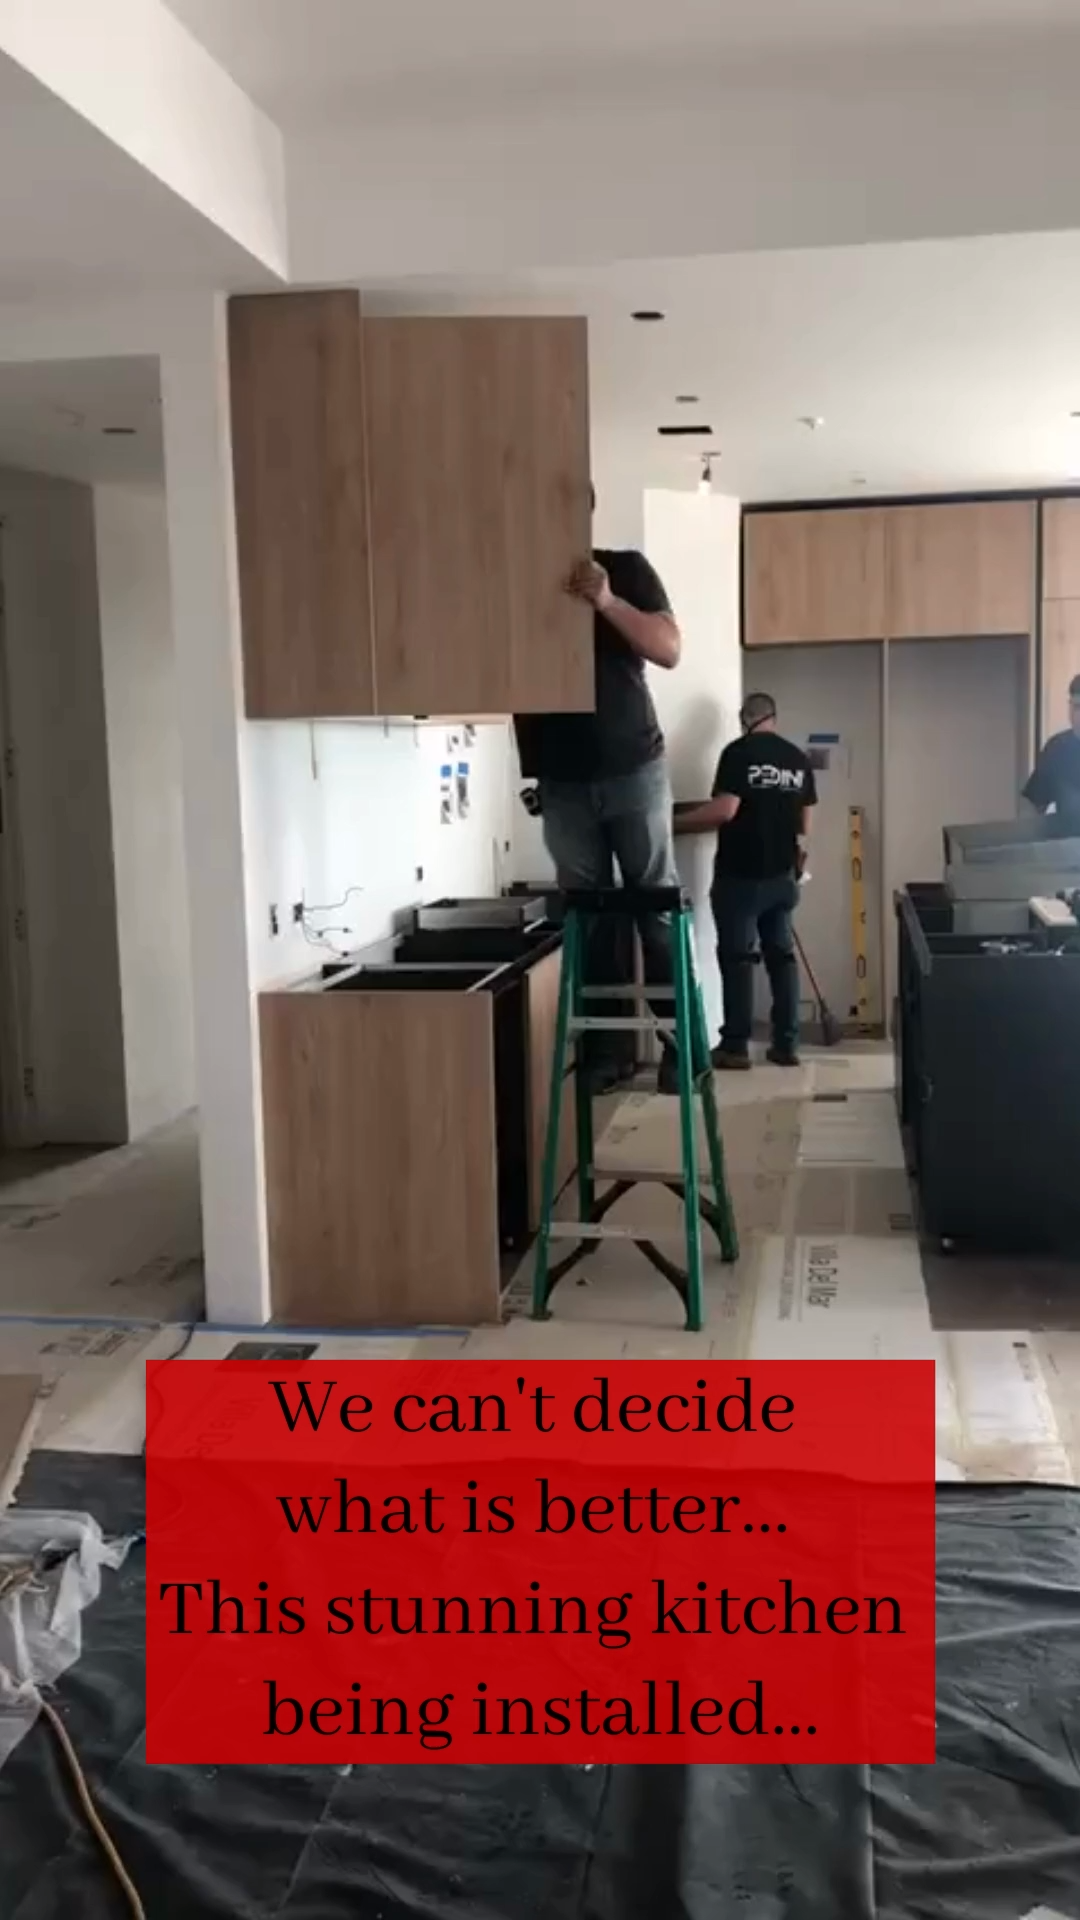 Kitchen install progress with a STUNNING view. #kitchendesign #moderndesign #modernhome #kitcheninspo #kitchengoals #kitchencabinets #kitchendetails #interiordesigner #interiordesigncontemporary #kitchenisland #renovationwork #dreamhomeinteriors #dreamhometoreality #homedesignideas #homedesigners #interiordesigncommunity #luxuryhomedesign #interiordesignlovers #customhome #waterfallisland #pedinila #pedinikitchens #lastyle #lalife #italiandesign #italiandesigner #italiandesignusa